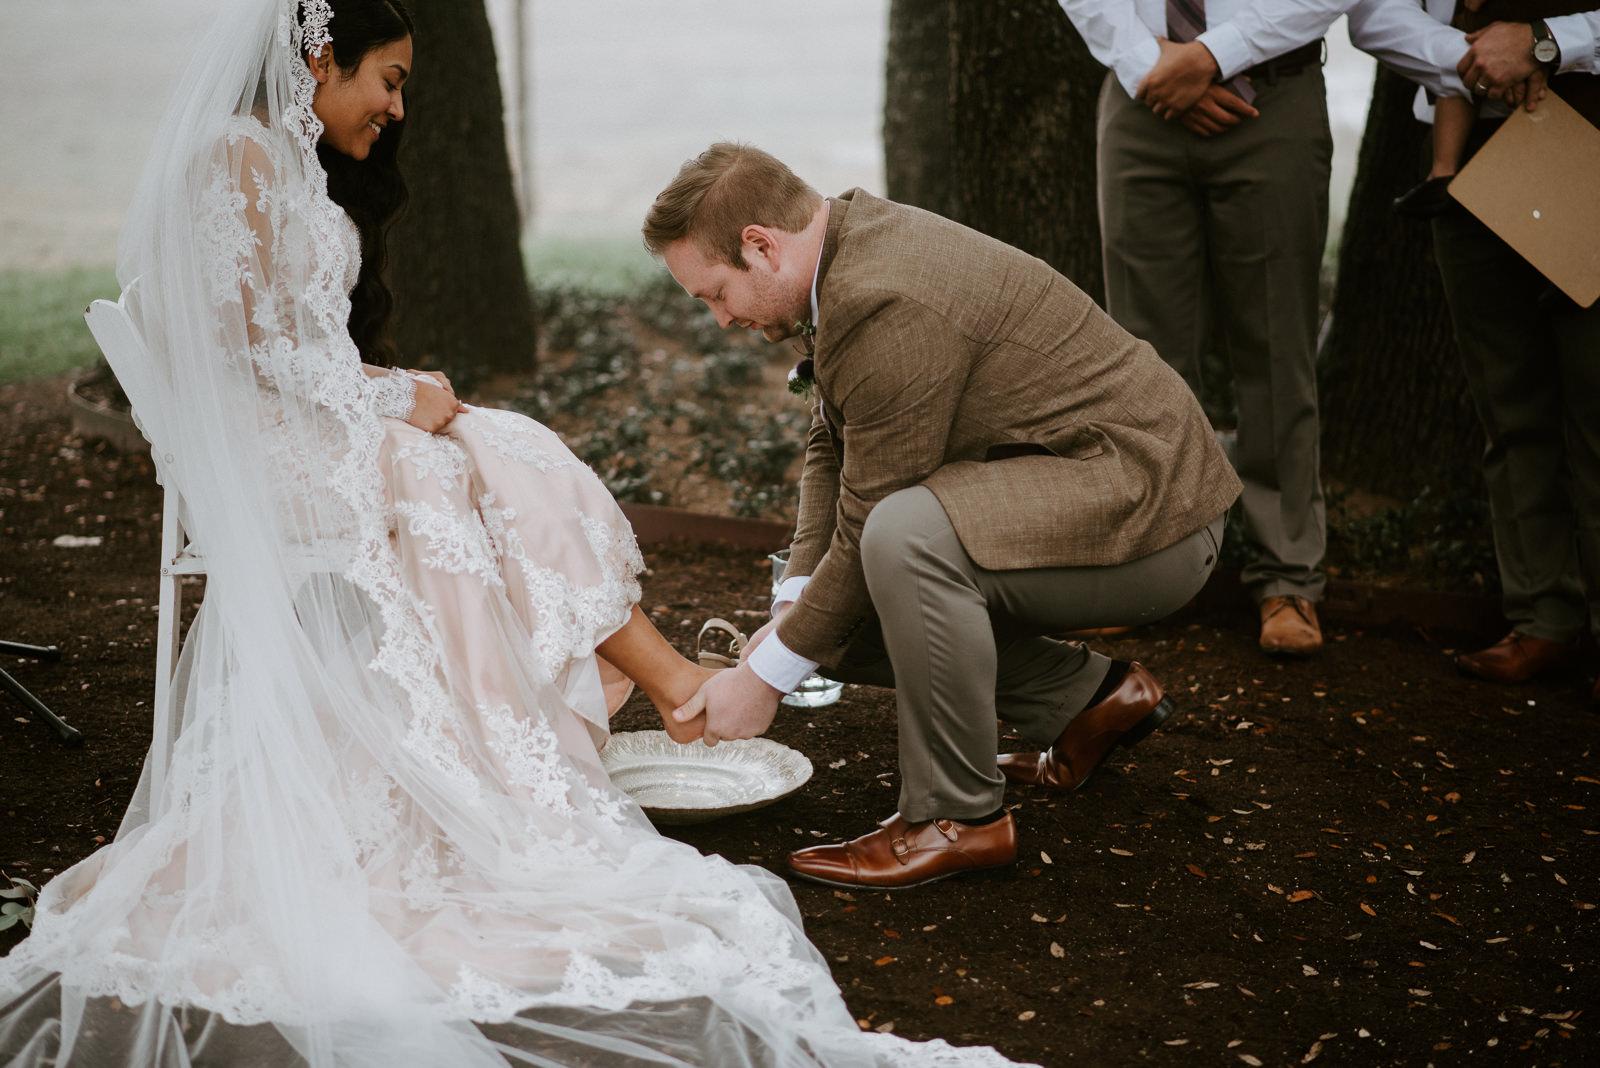 feet washing ritual at wedding ceremony